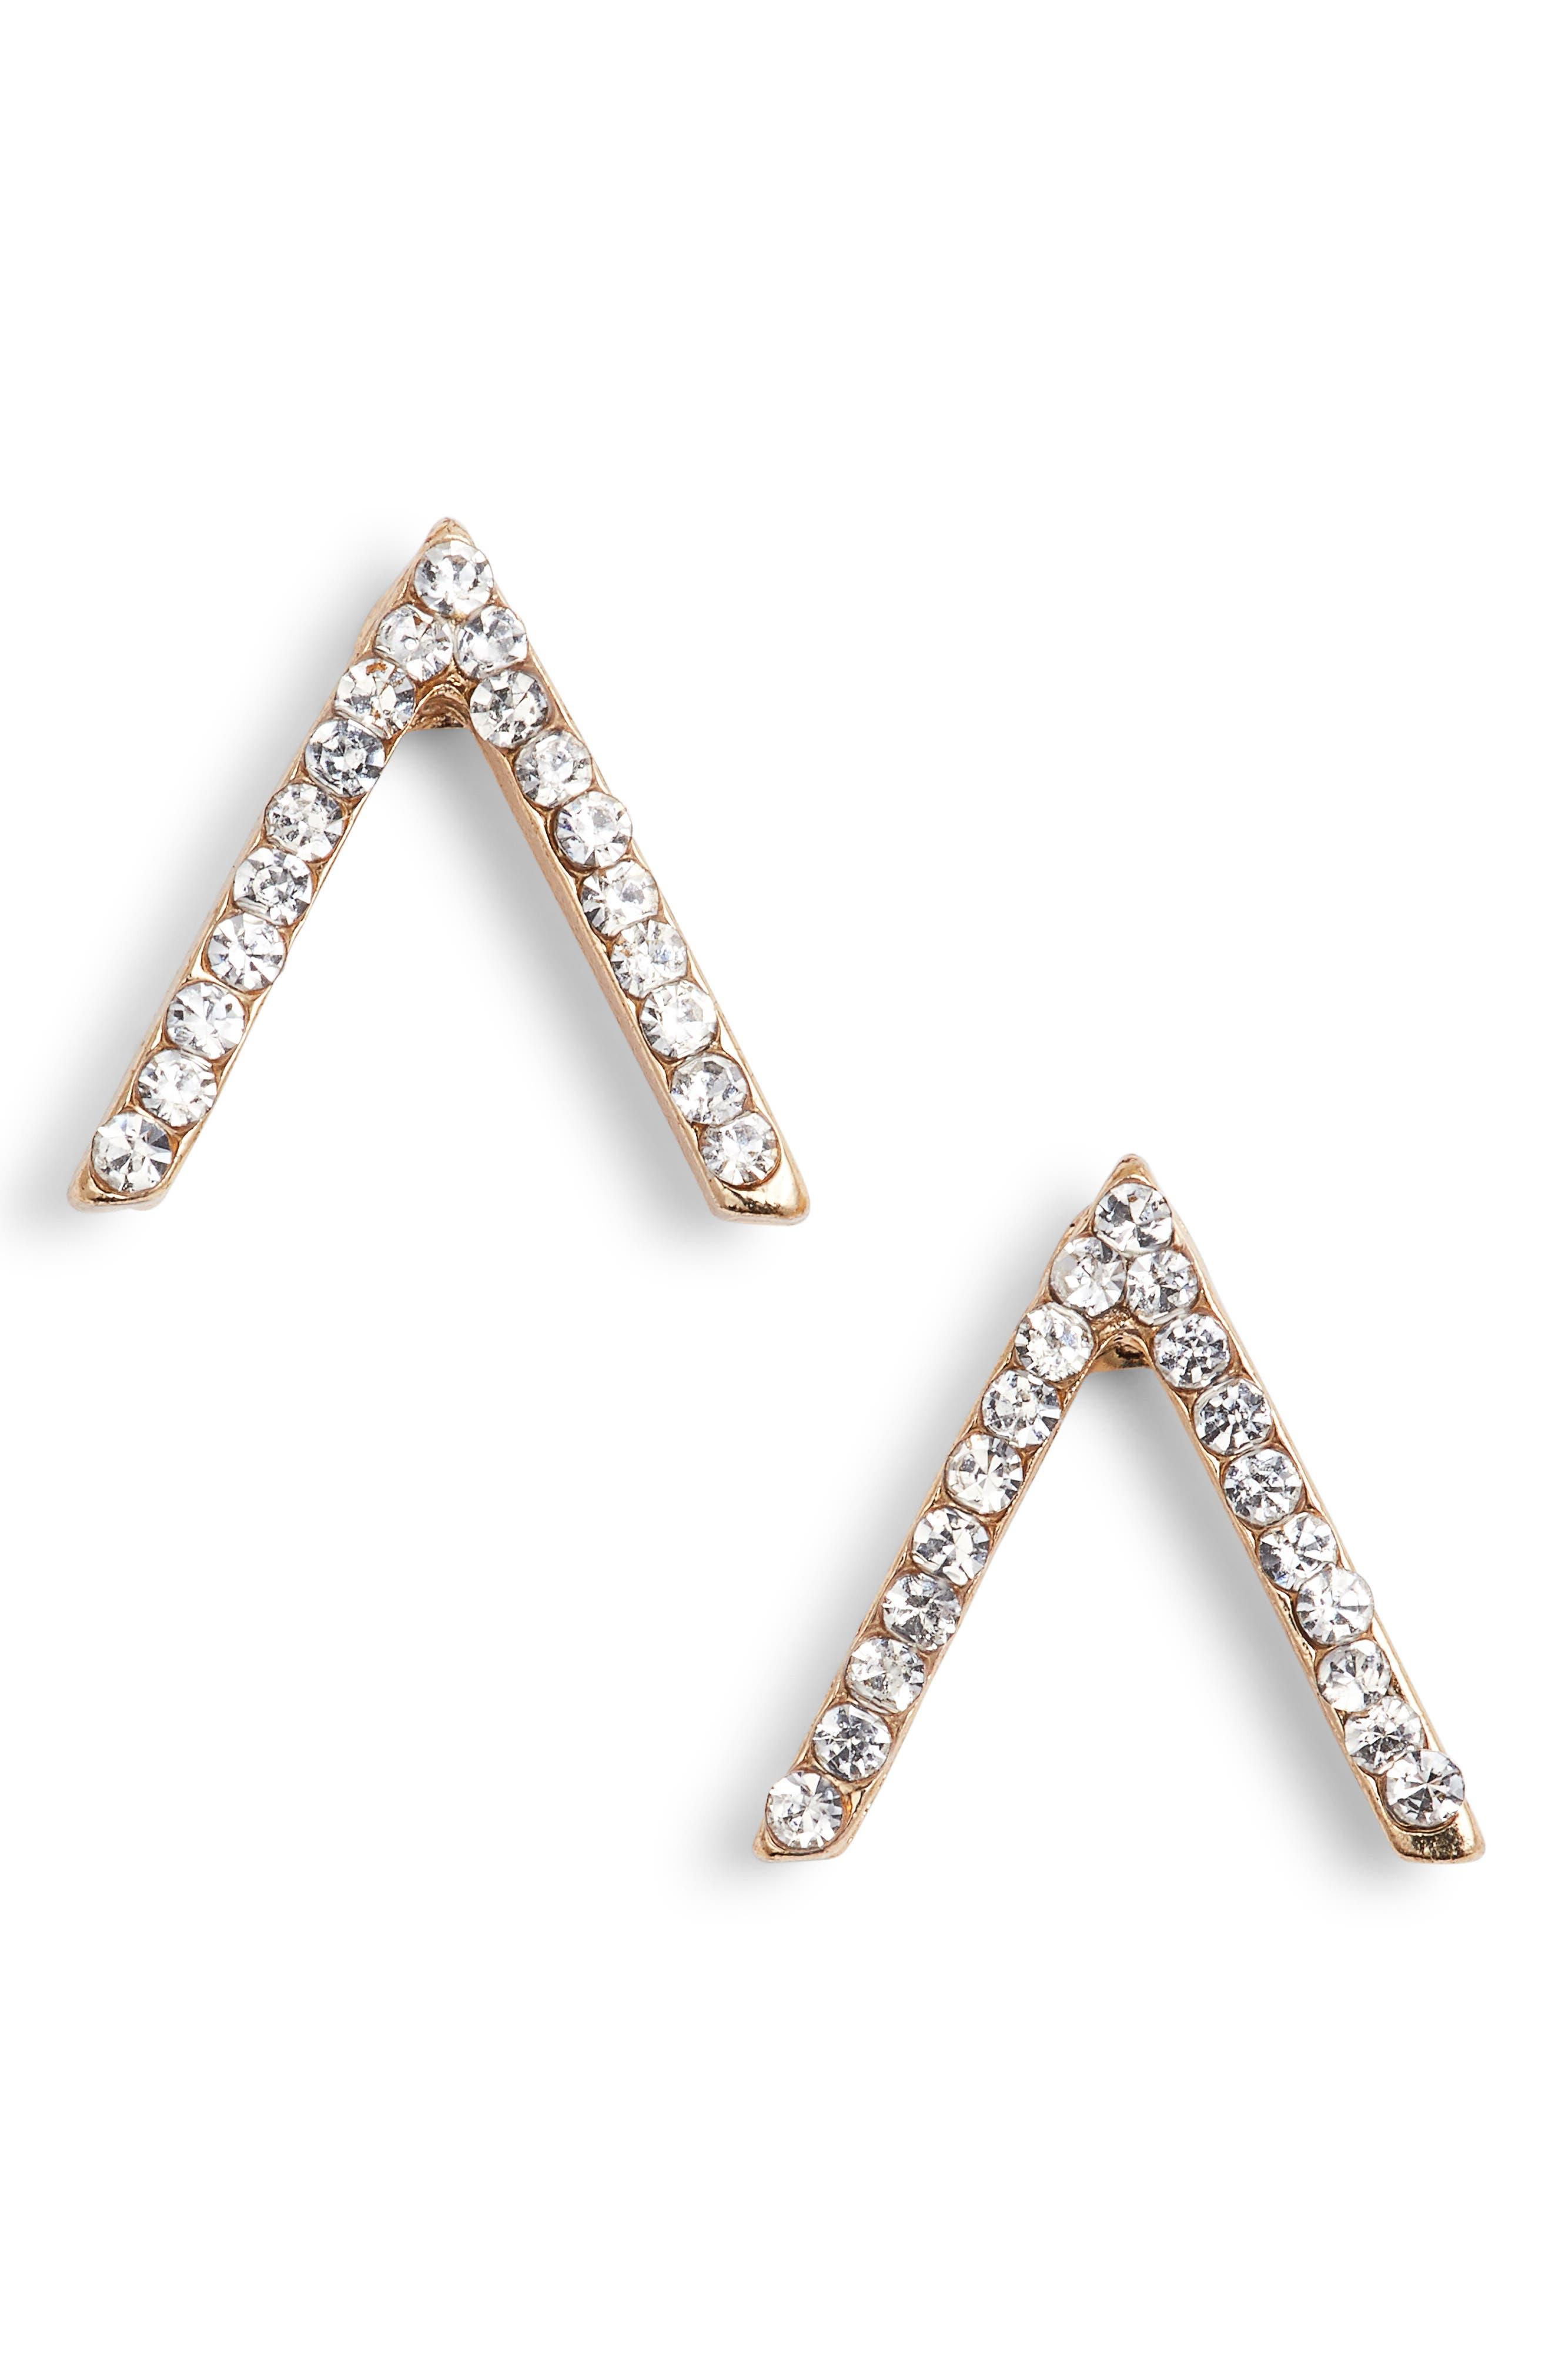 Crystal Chevron Stud Earrings,                             Main thumbnail 1, color,                             Gold